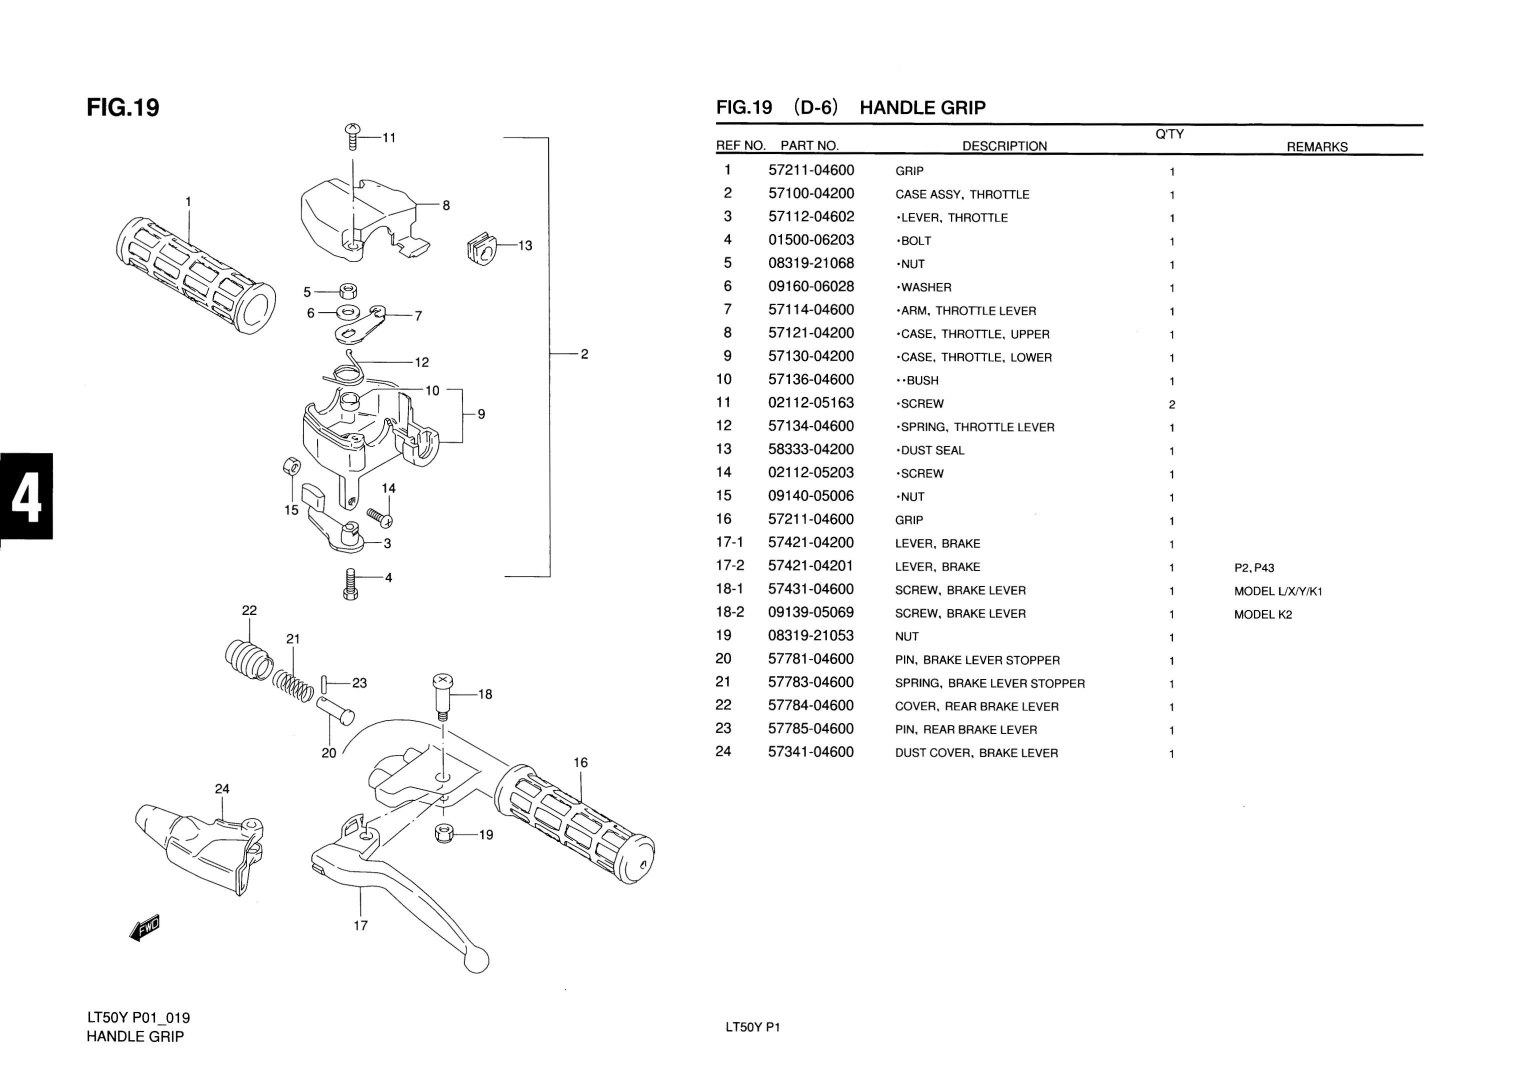 Genuine Suzuki LT50 Motorcycle ATV Parts Cover 57784-04600